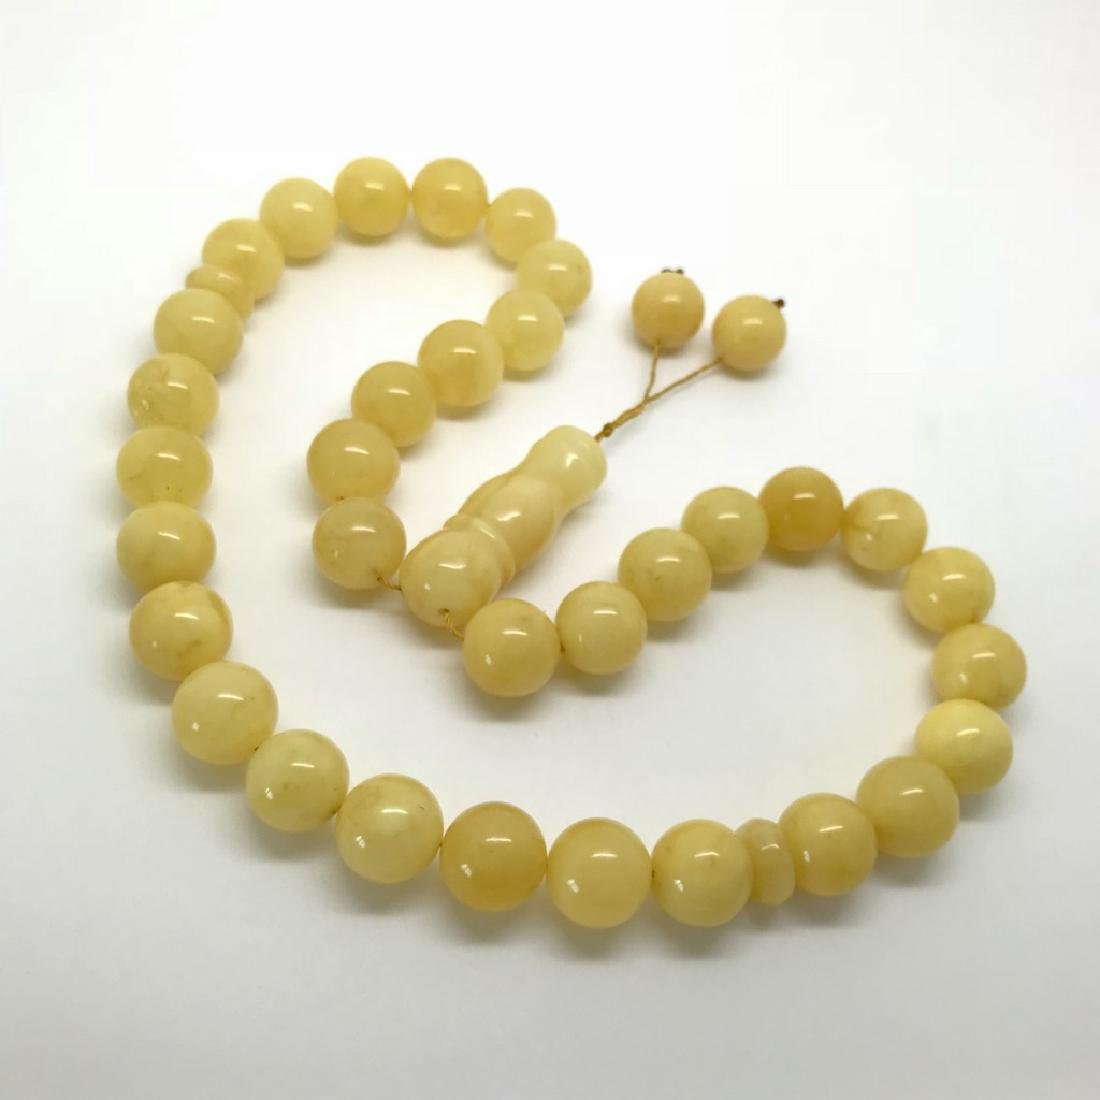 Misbaha tesbih Baltic amber yellow 33 beads ø12.5mm